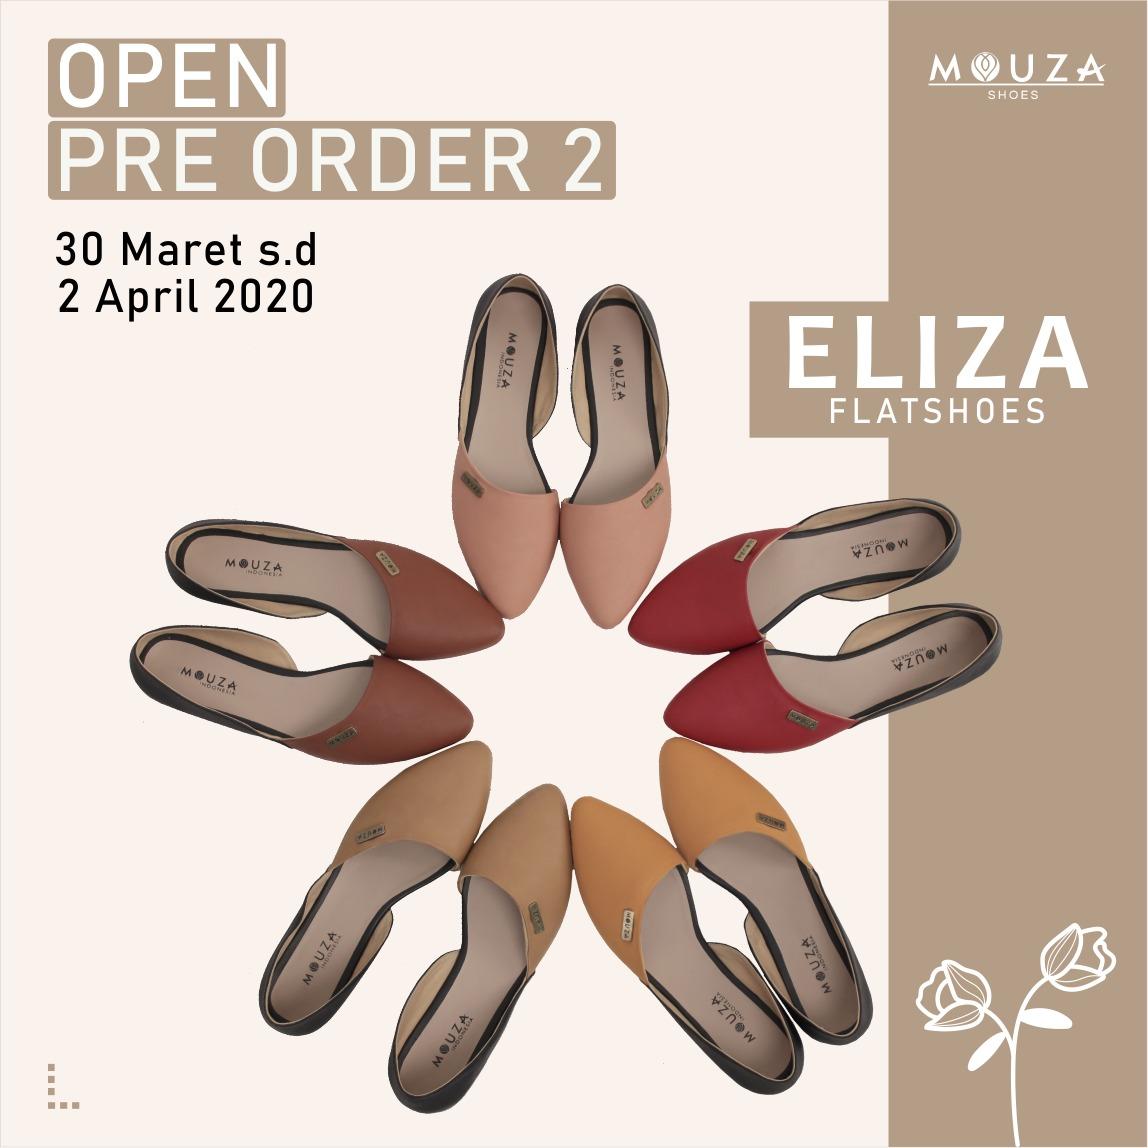 PO 2 Flatshoes Eliza